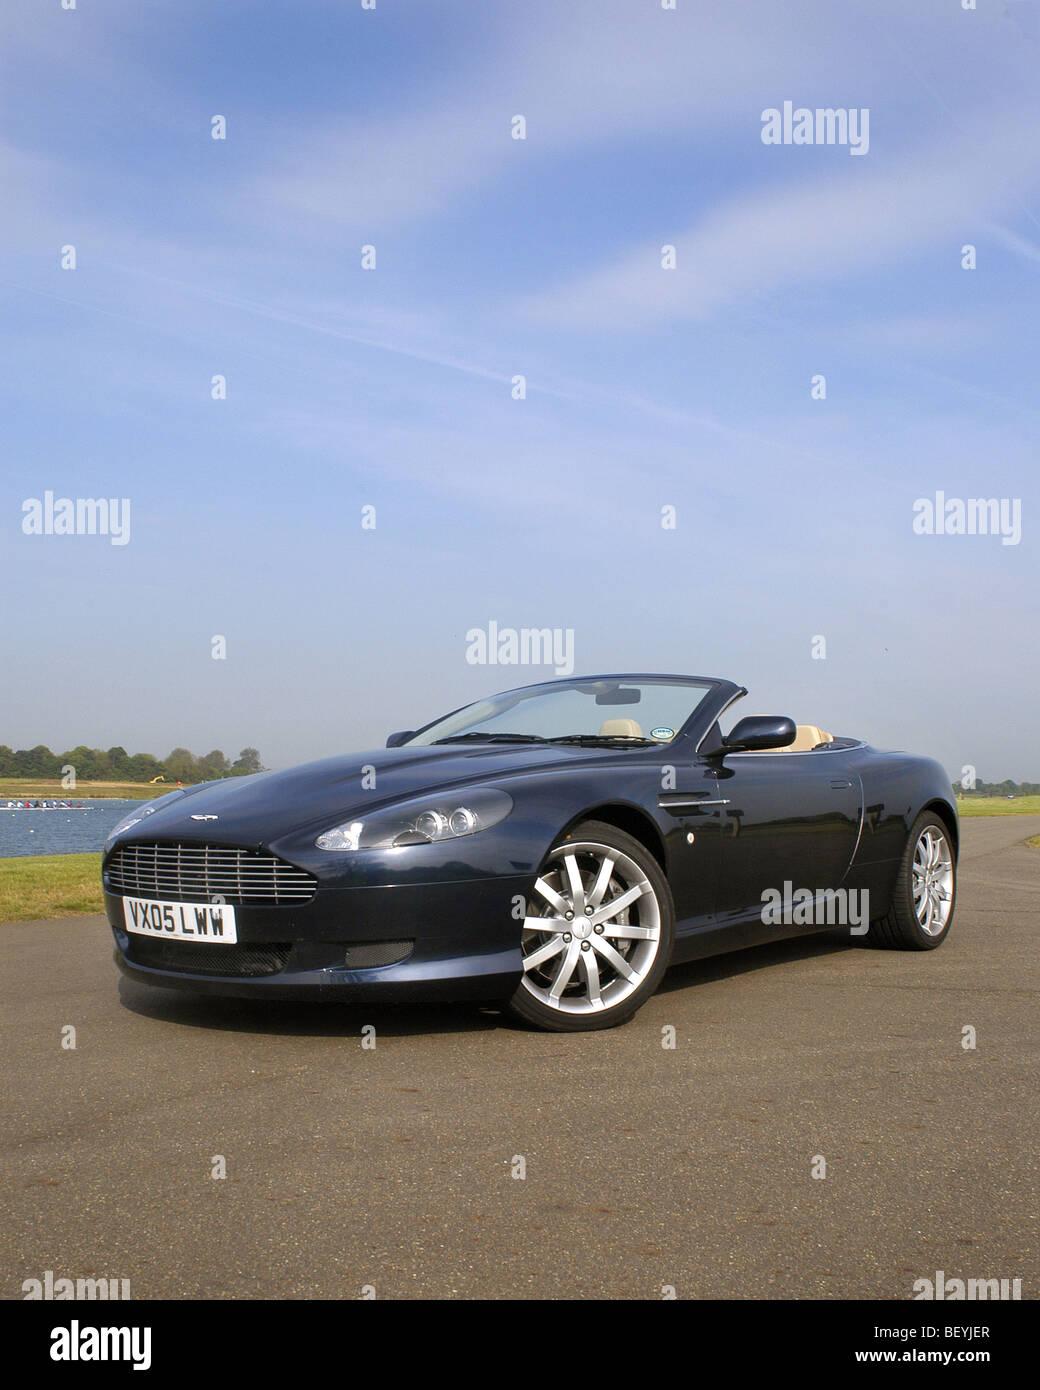 Aston Martin DB9 Volante - Stock Image